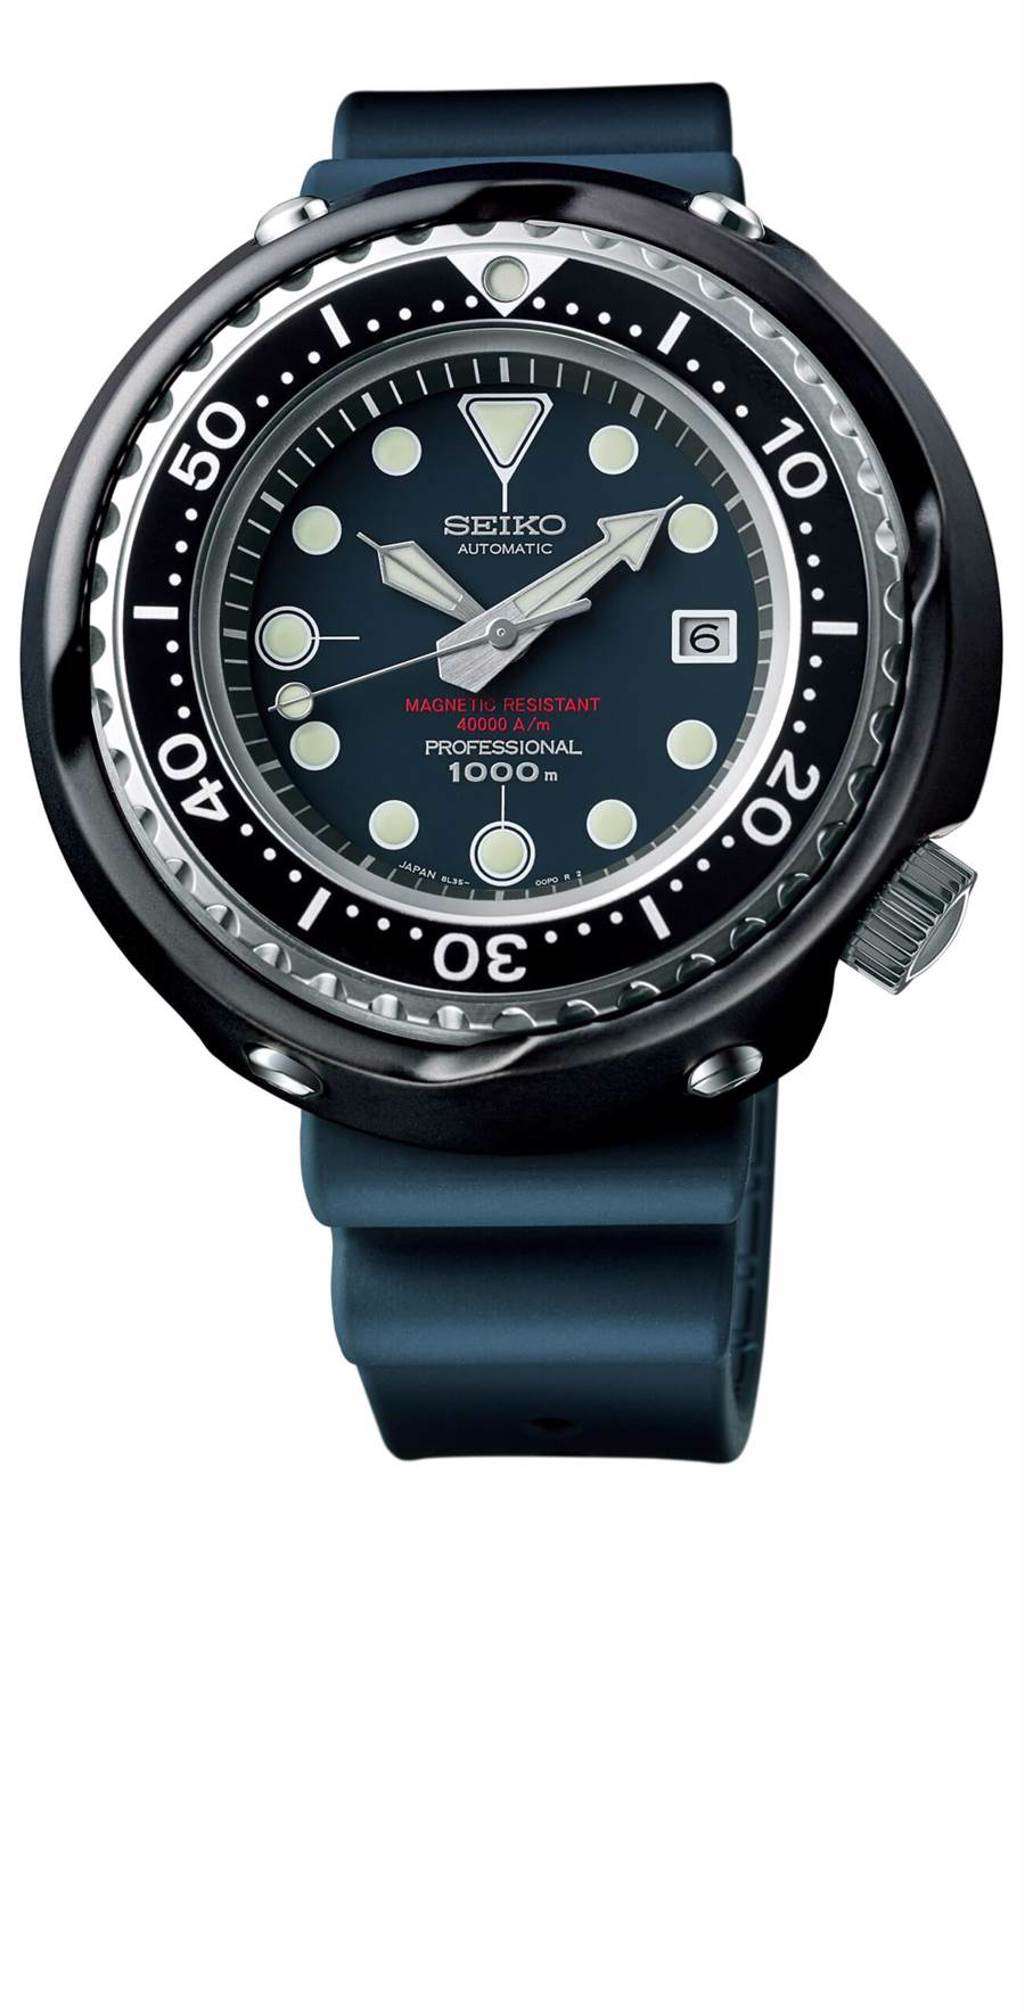 SEIKO Prospex 1975復刻版潛水表,防水1000米,限量55只,14萬8000元。(SEIKO提供)